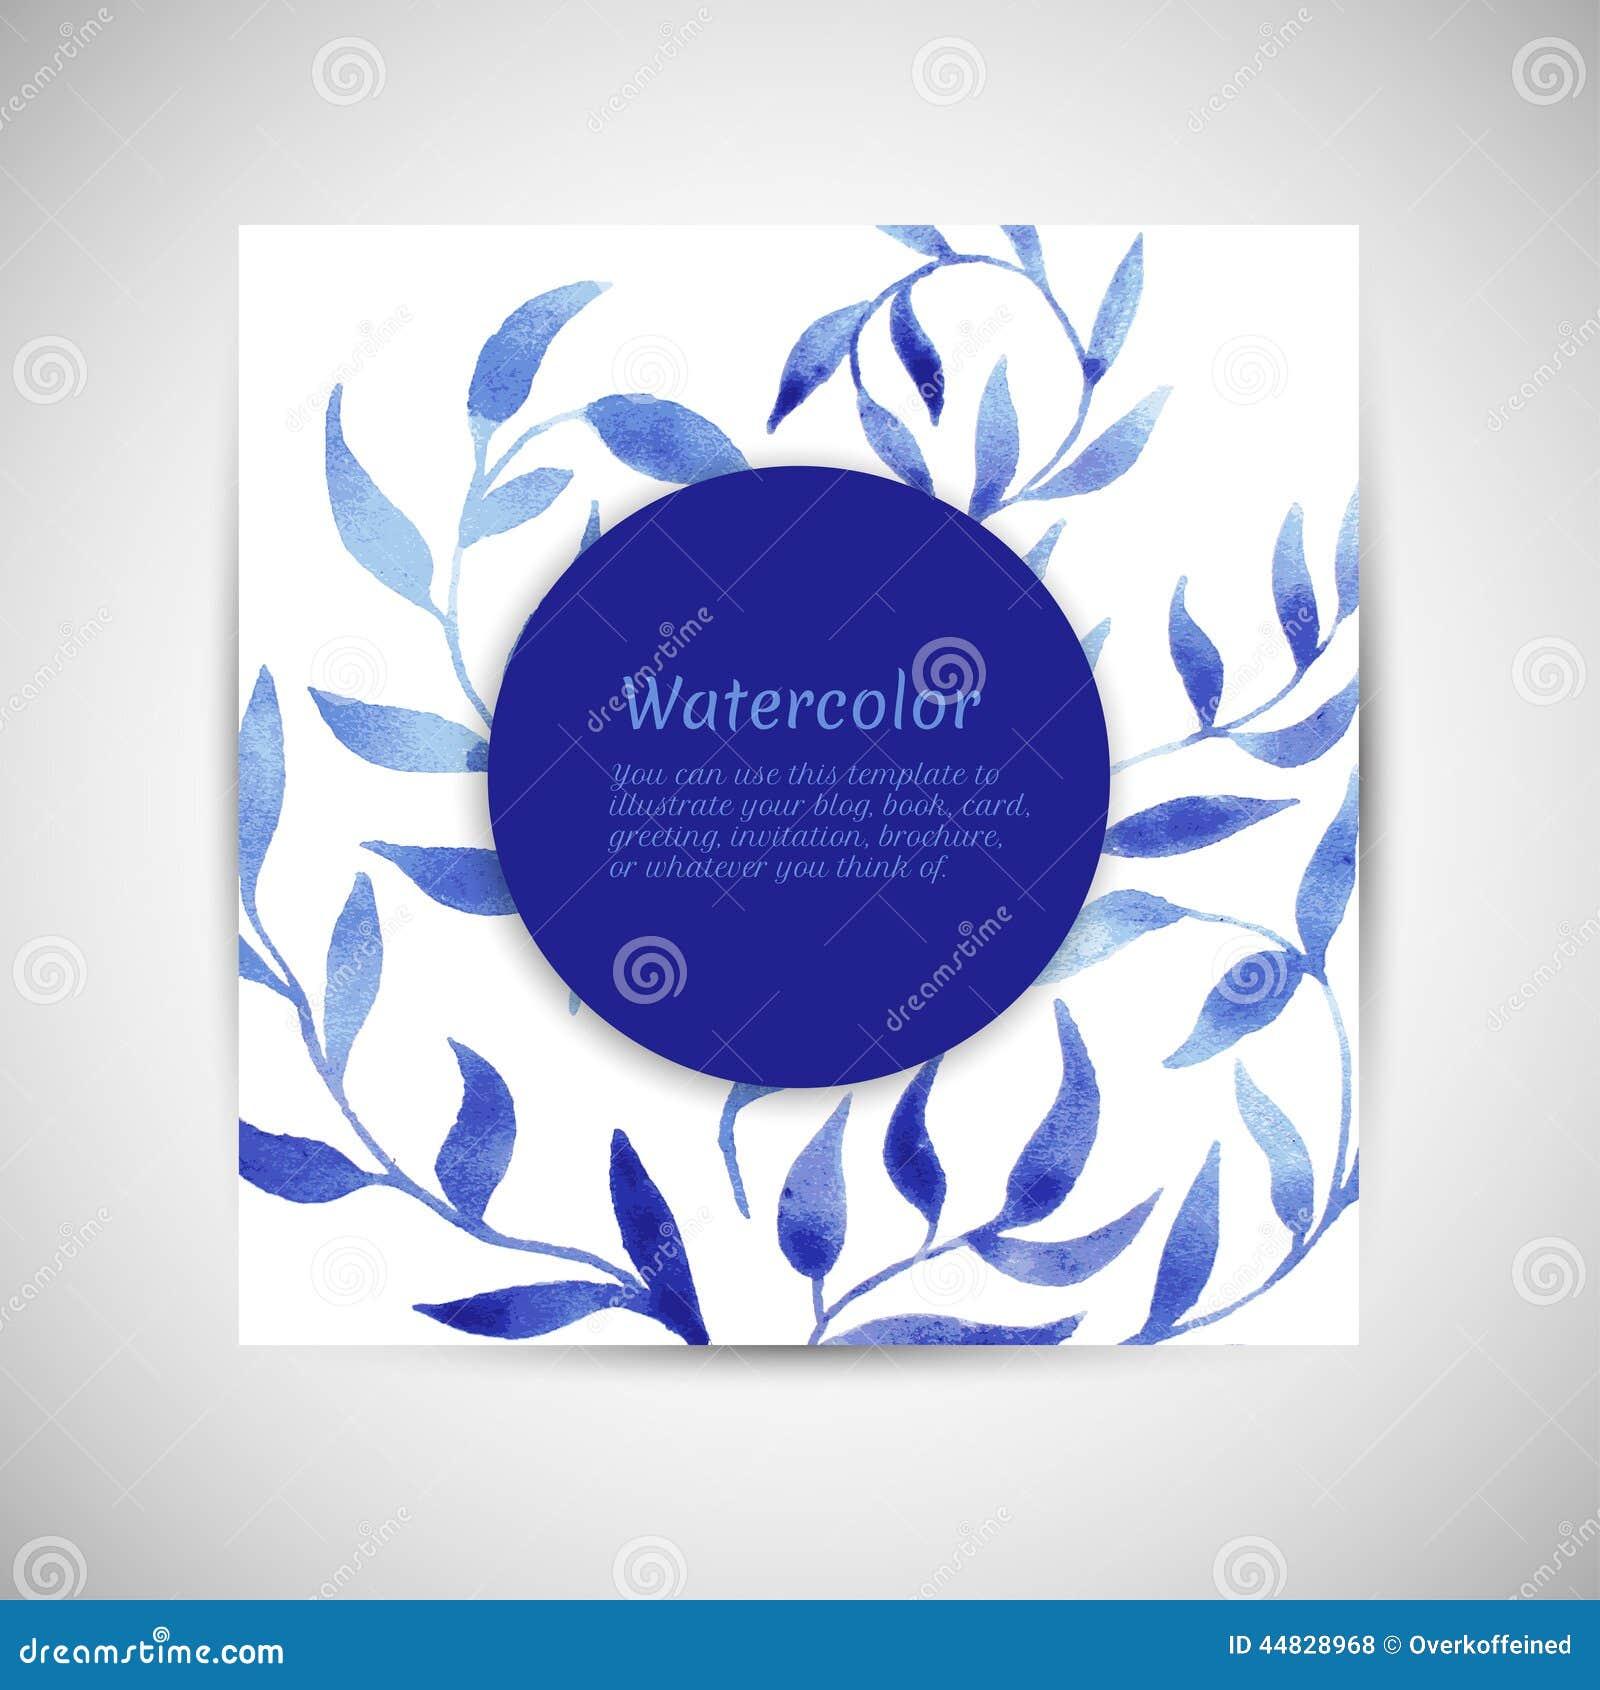 Vector Blue Gzhel Watercolor Leaf Pattern Template